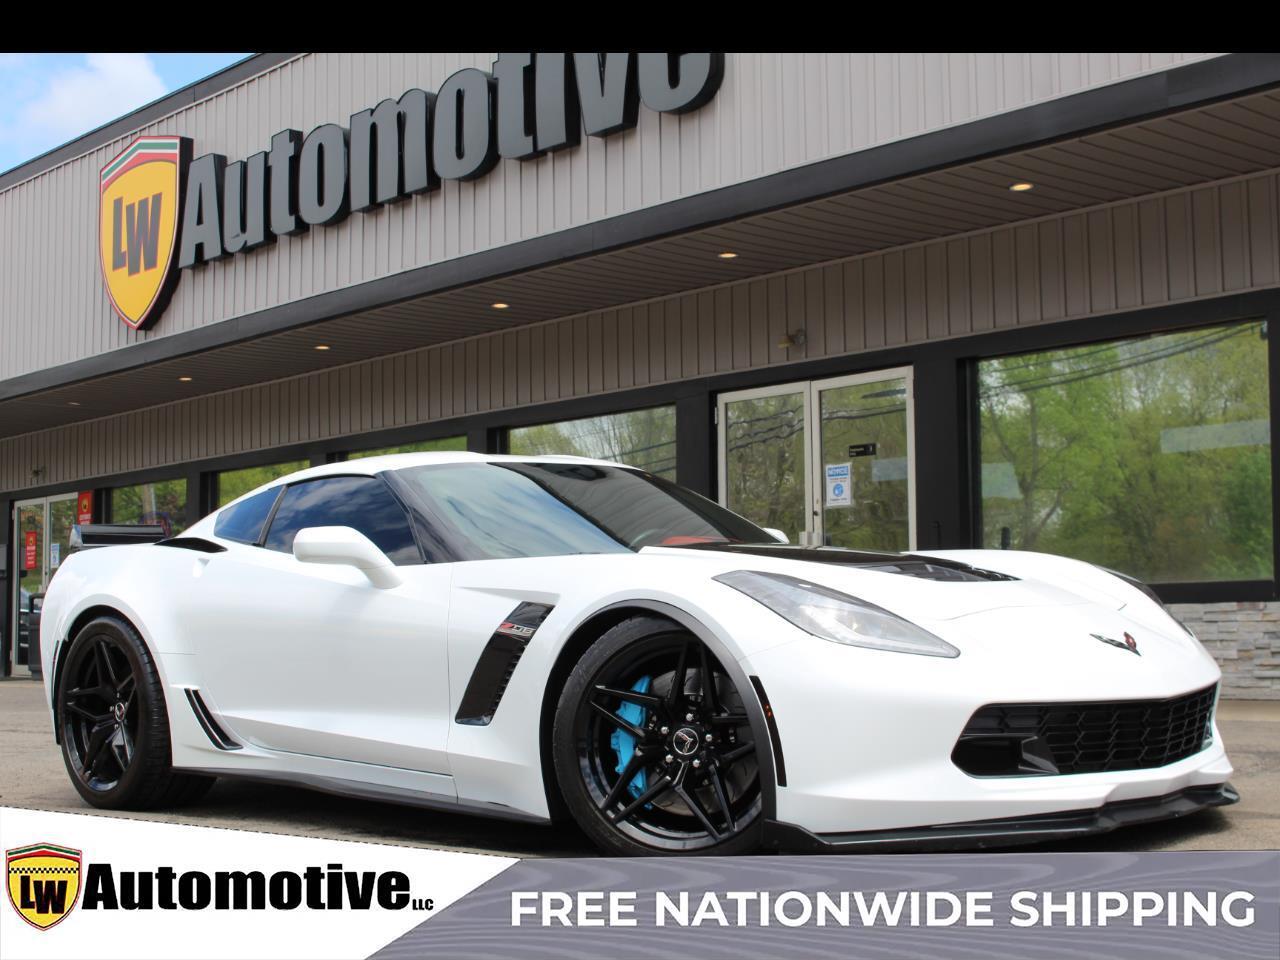 2015 Chevrolet Corvette 2dr Z06 Cpe w/2LZ